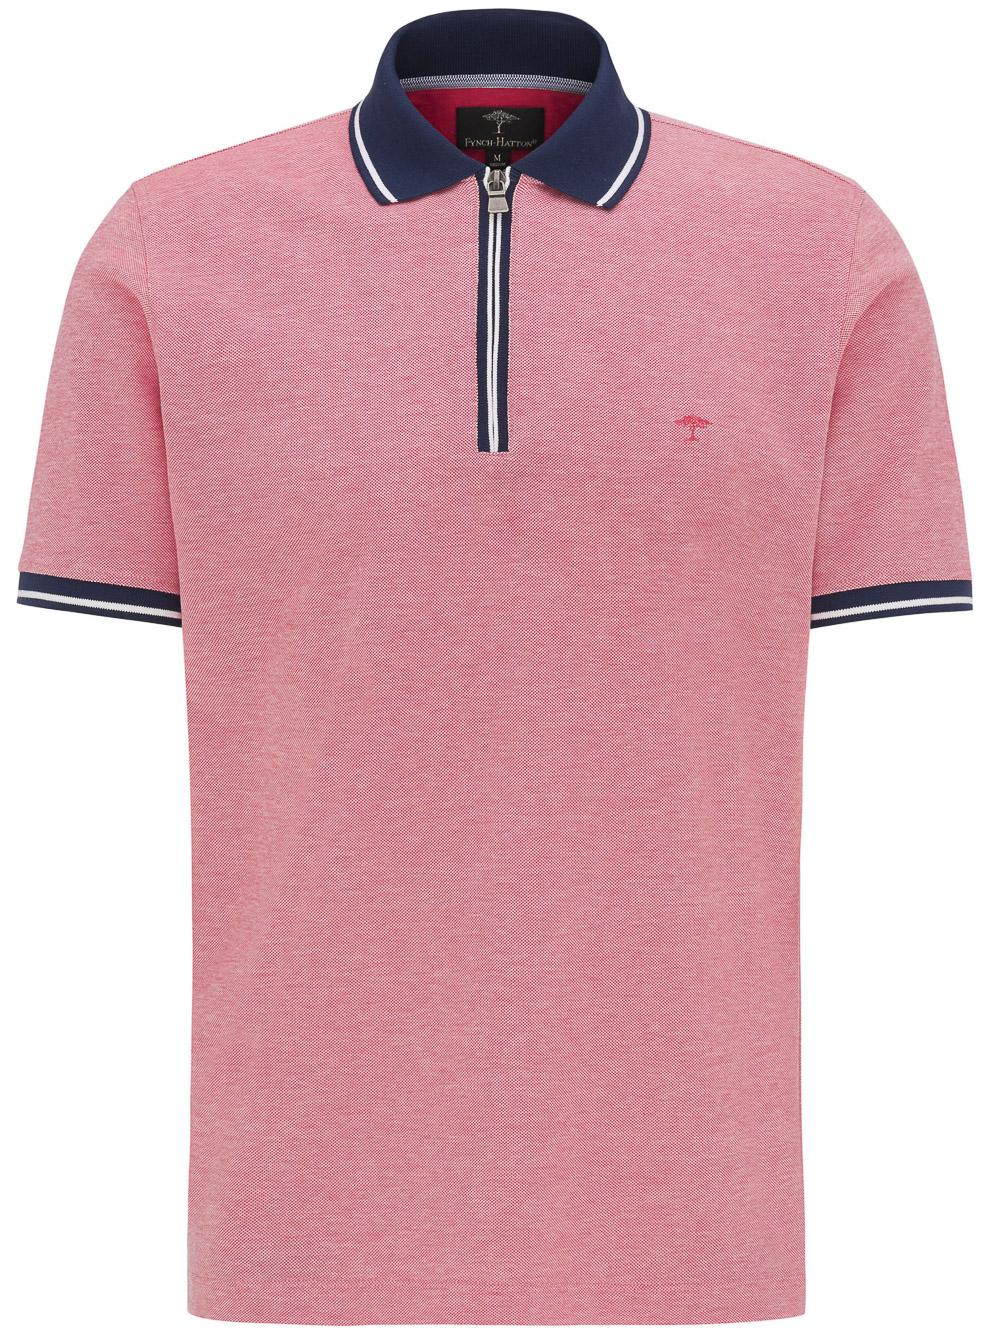 FYNCH-HATTON Μπλούζα Polo 1120 1754-1415 ΚΟΡΑΛΙ